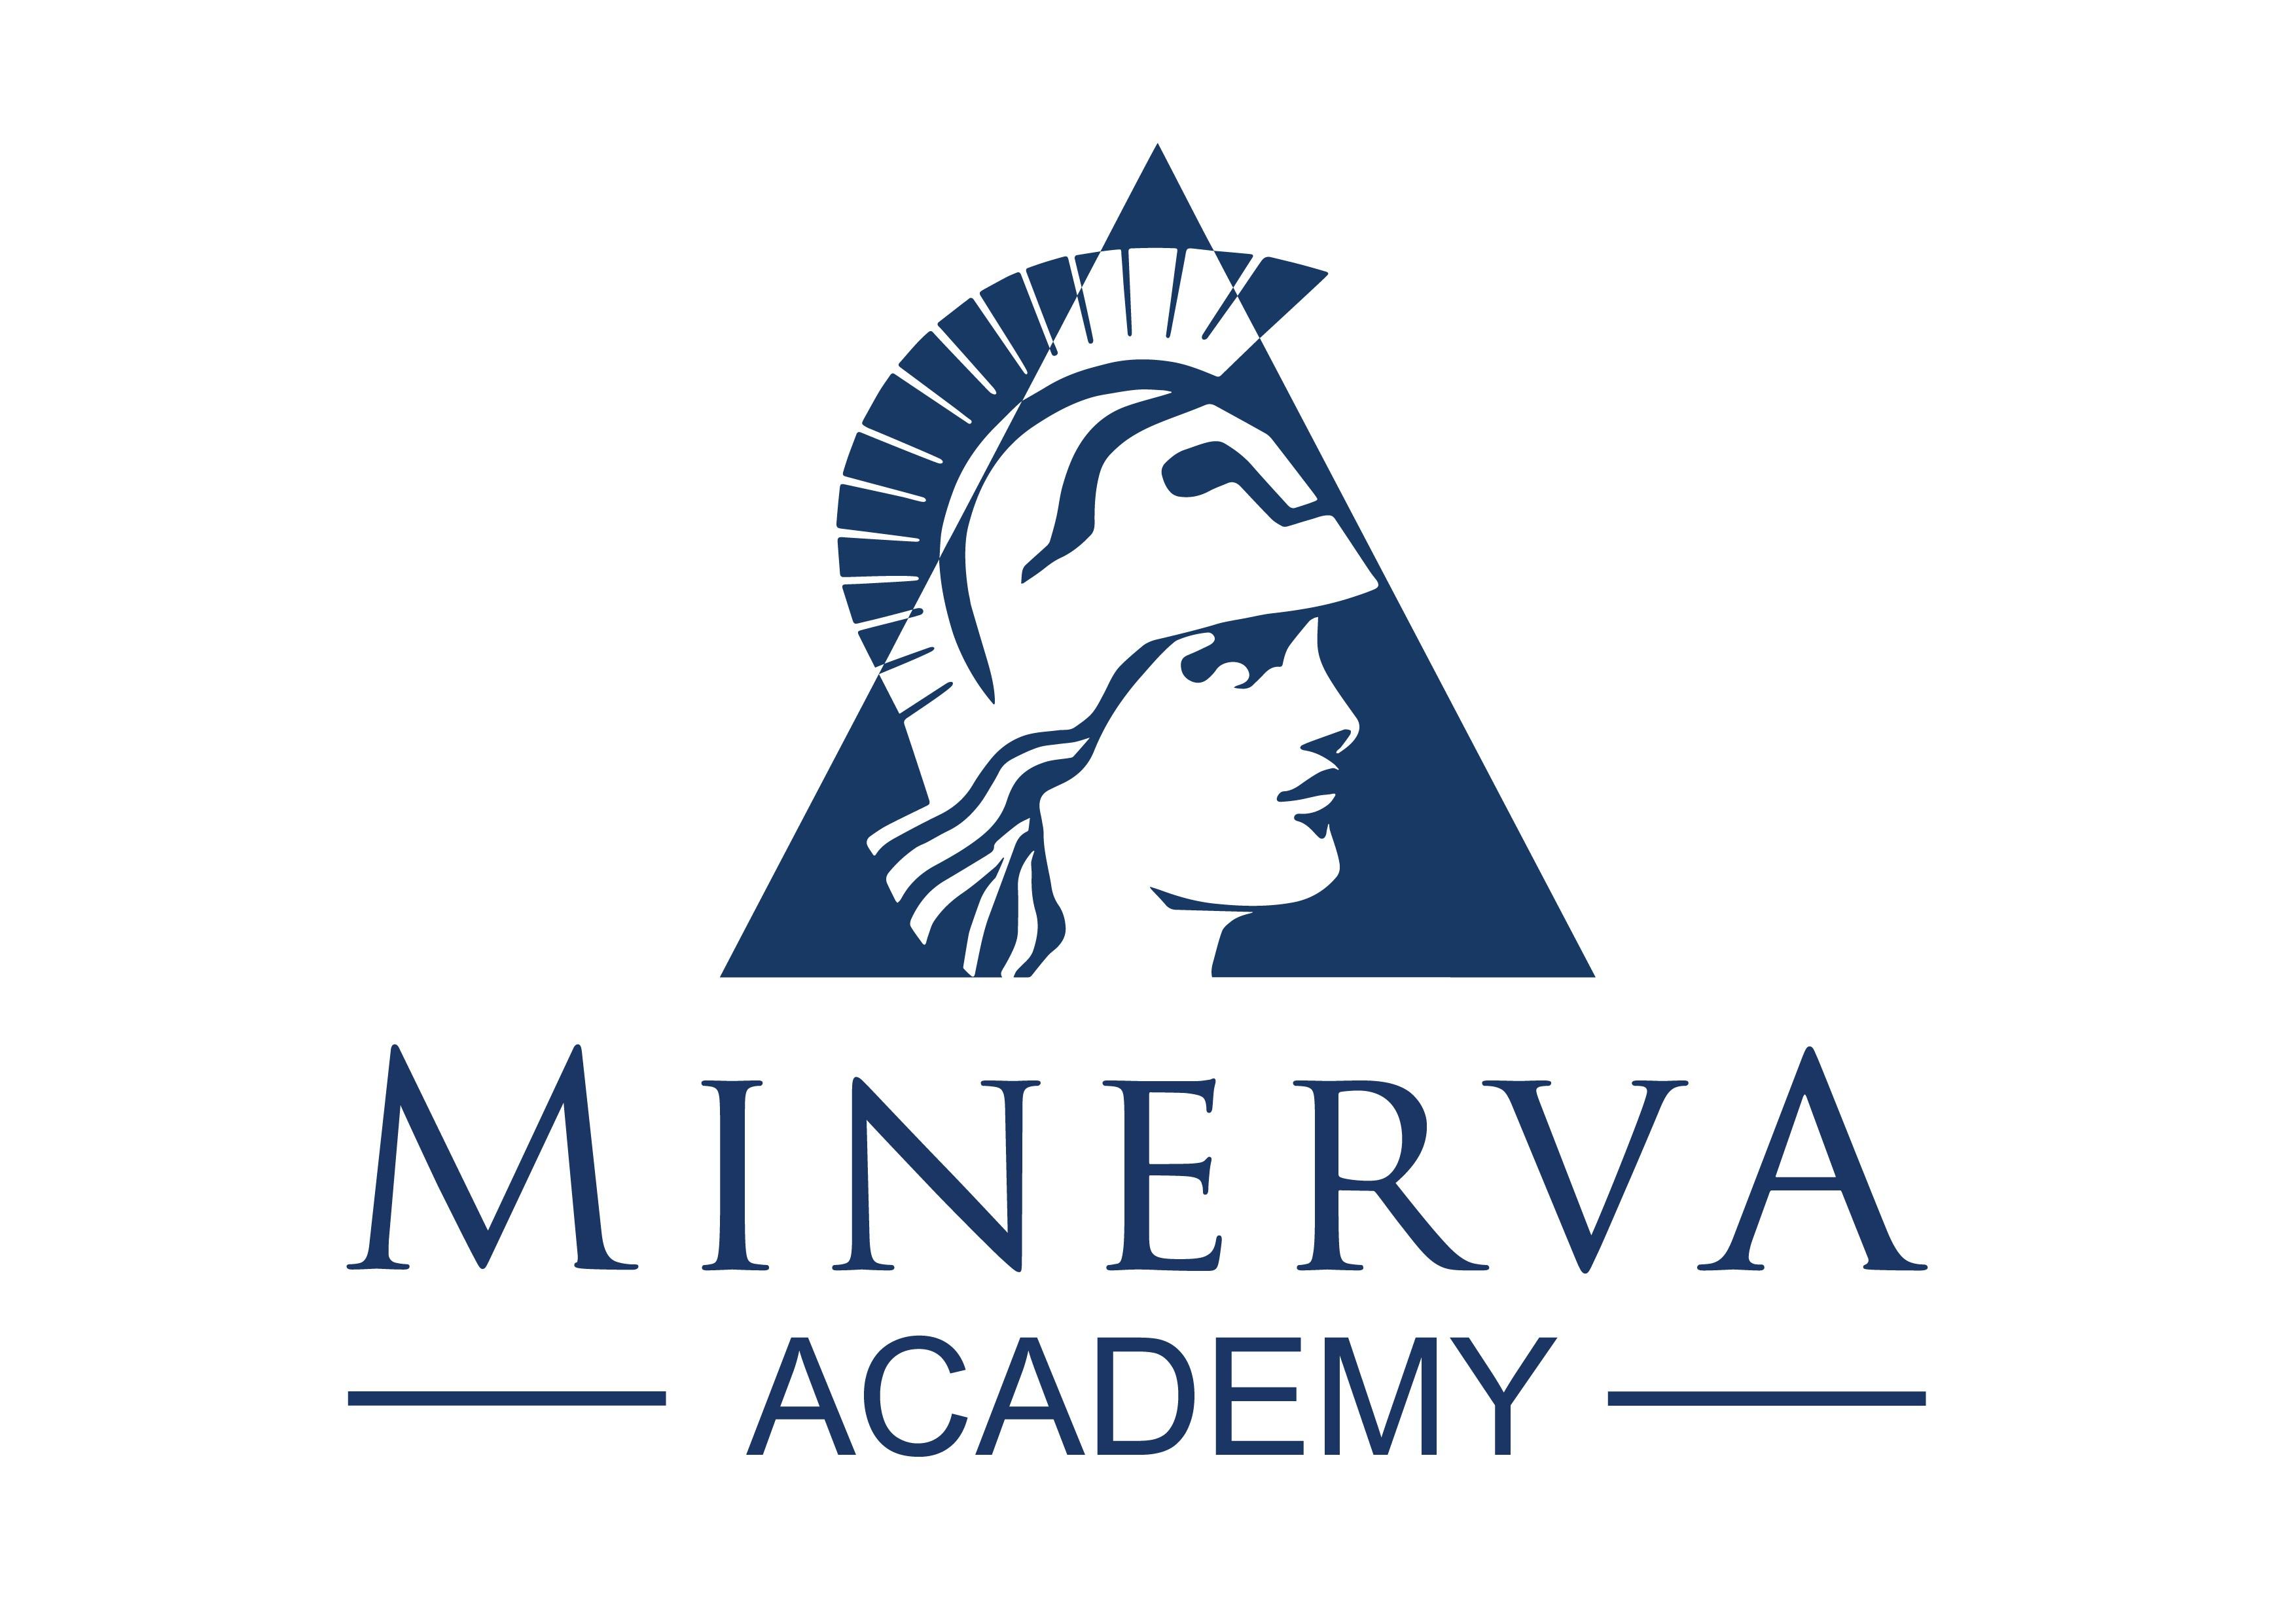 Minerva Academy Logo Design with modern concepts